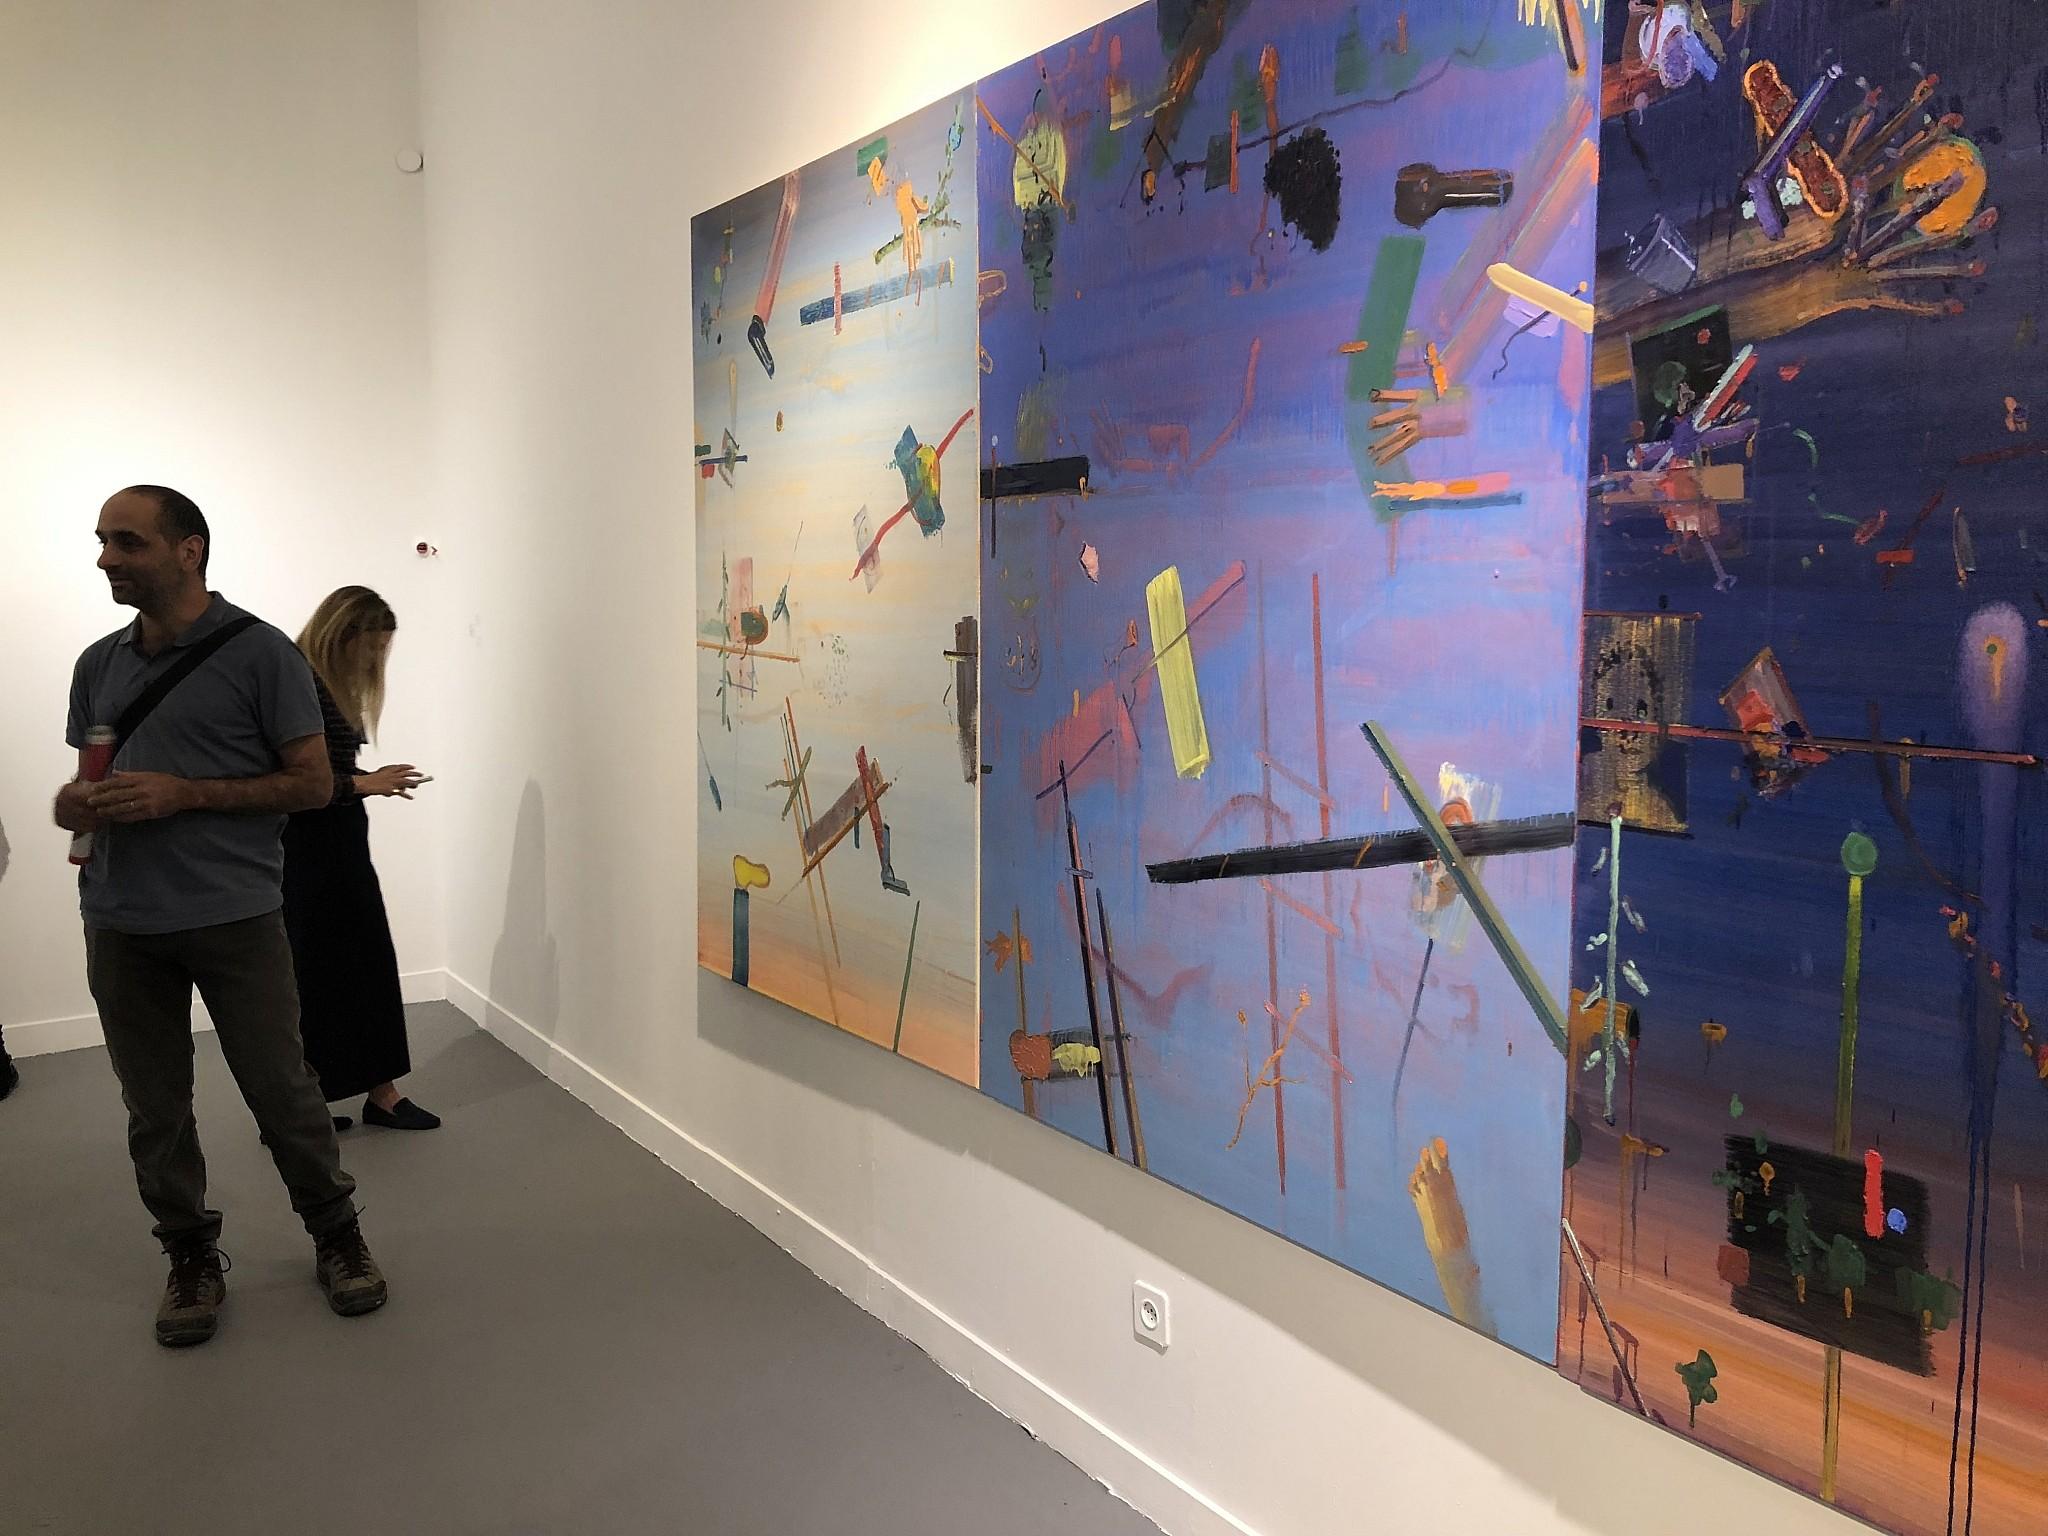 Art examines creation of bogus realities in Haifa's 'Fake